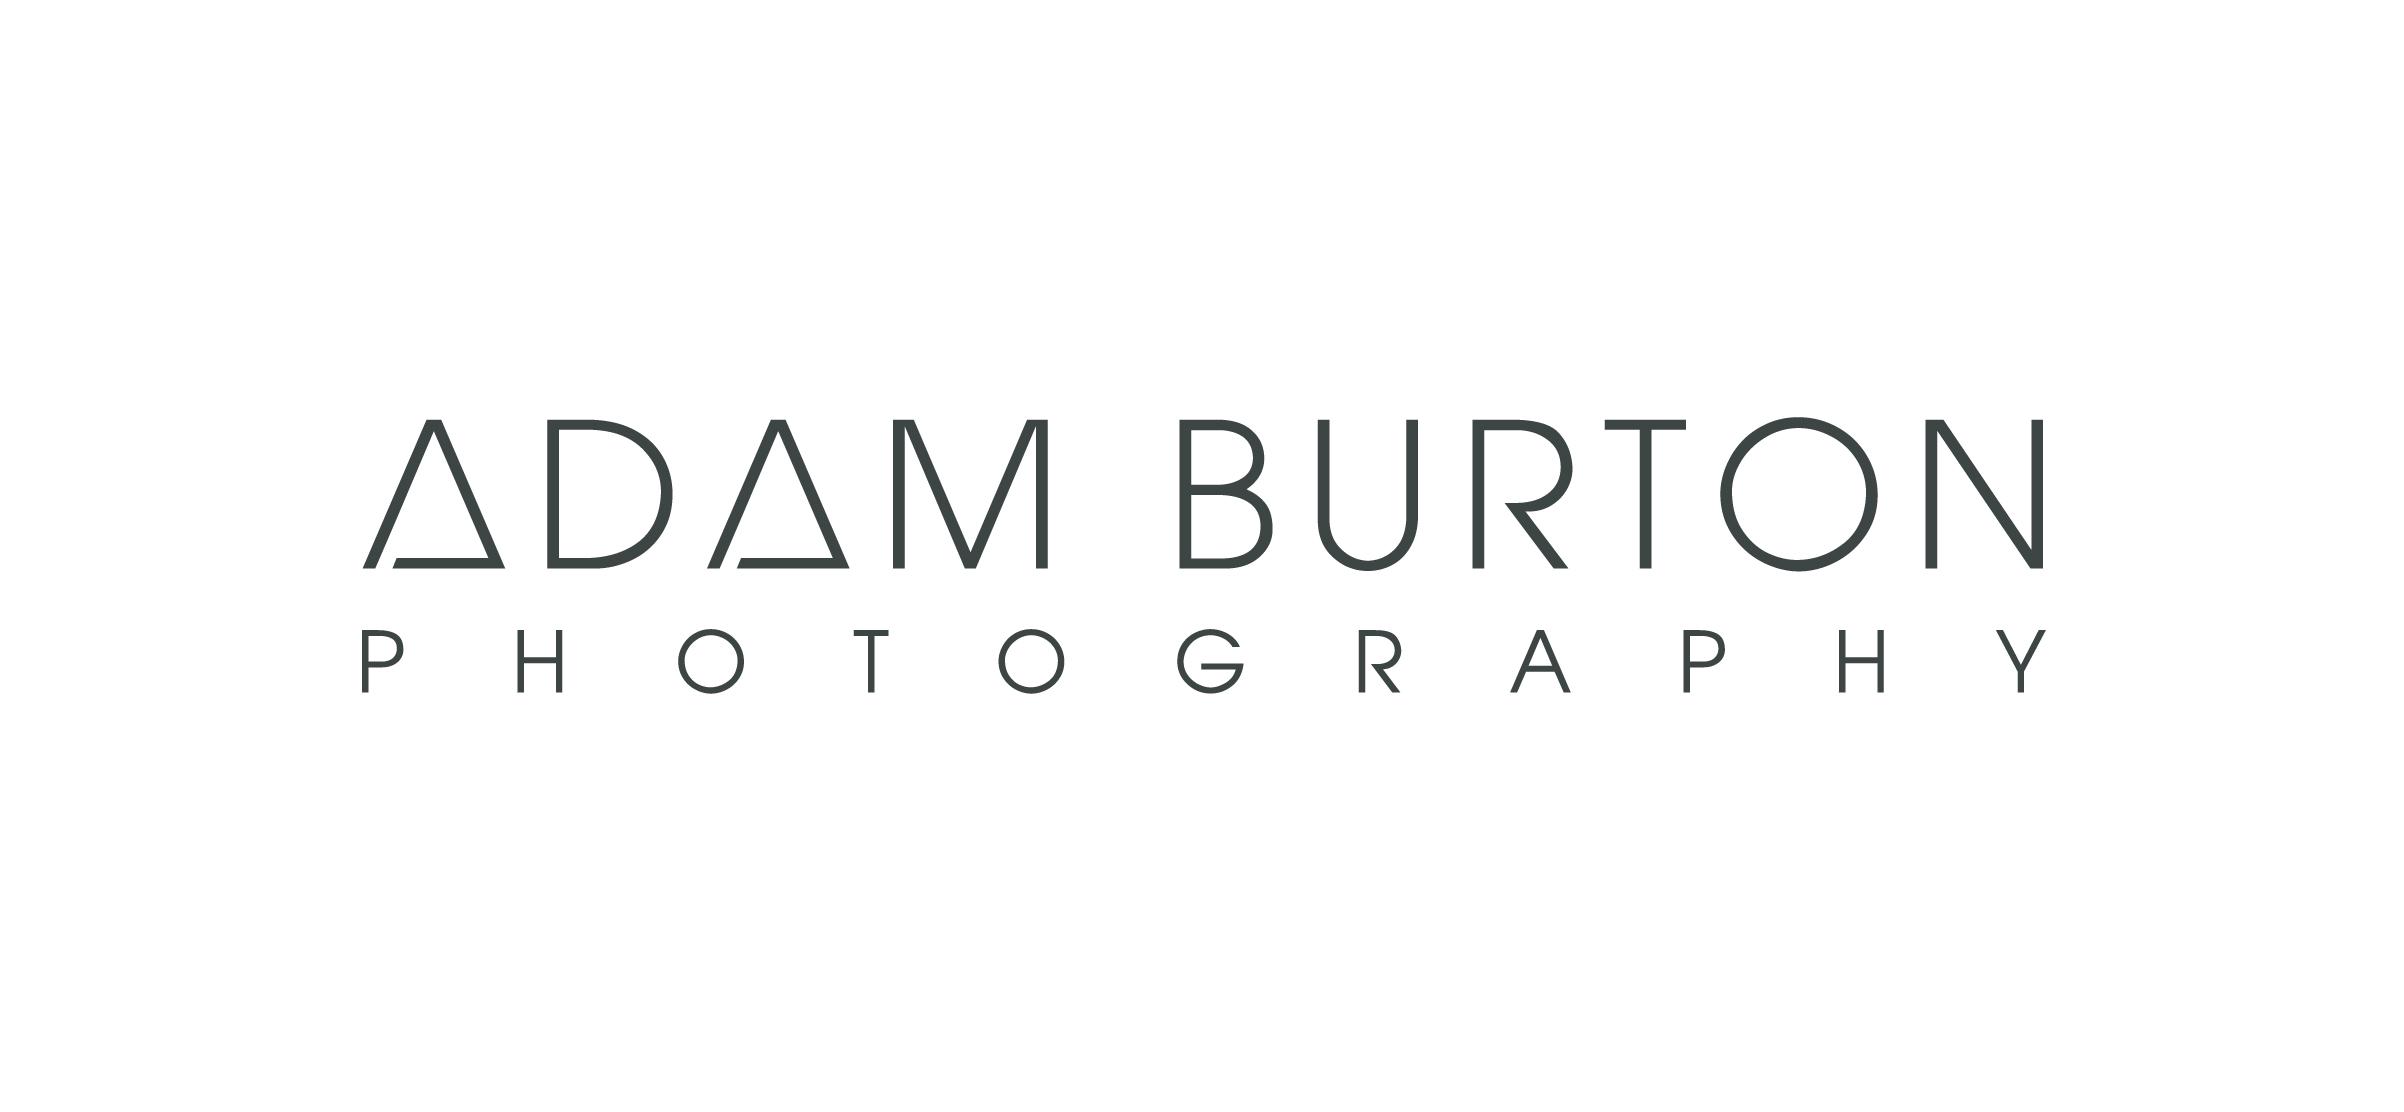 (c) Adamburtonphotography.com